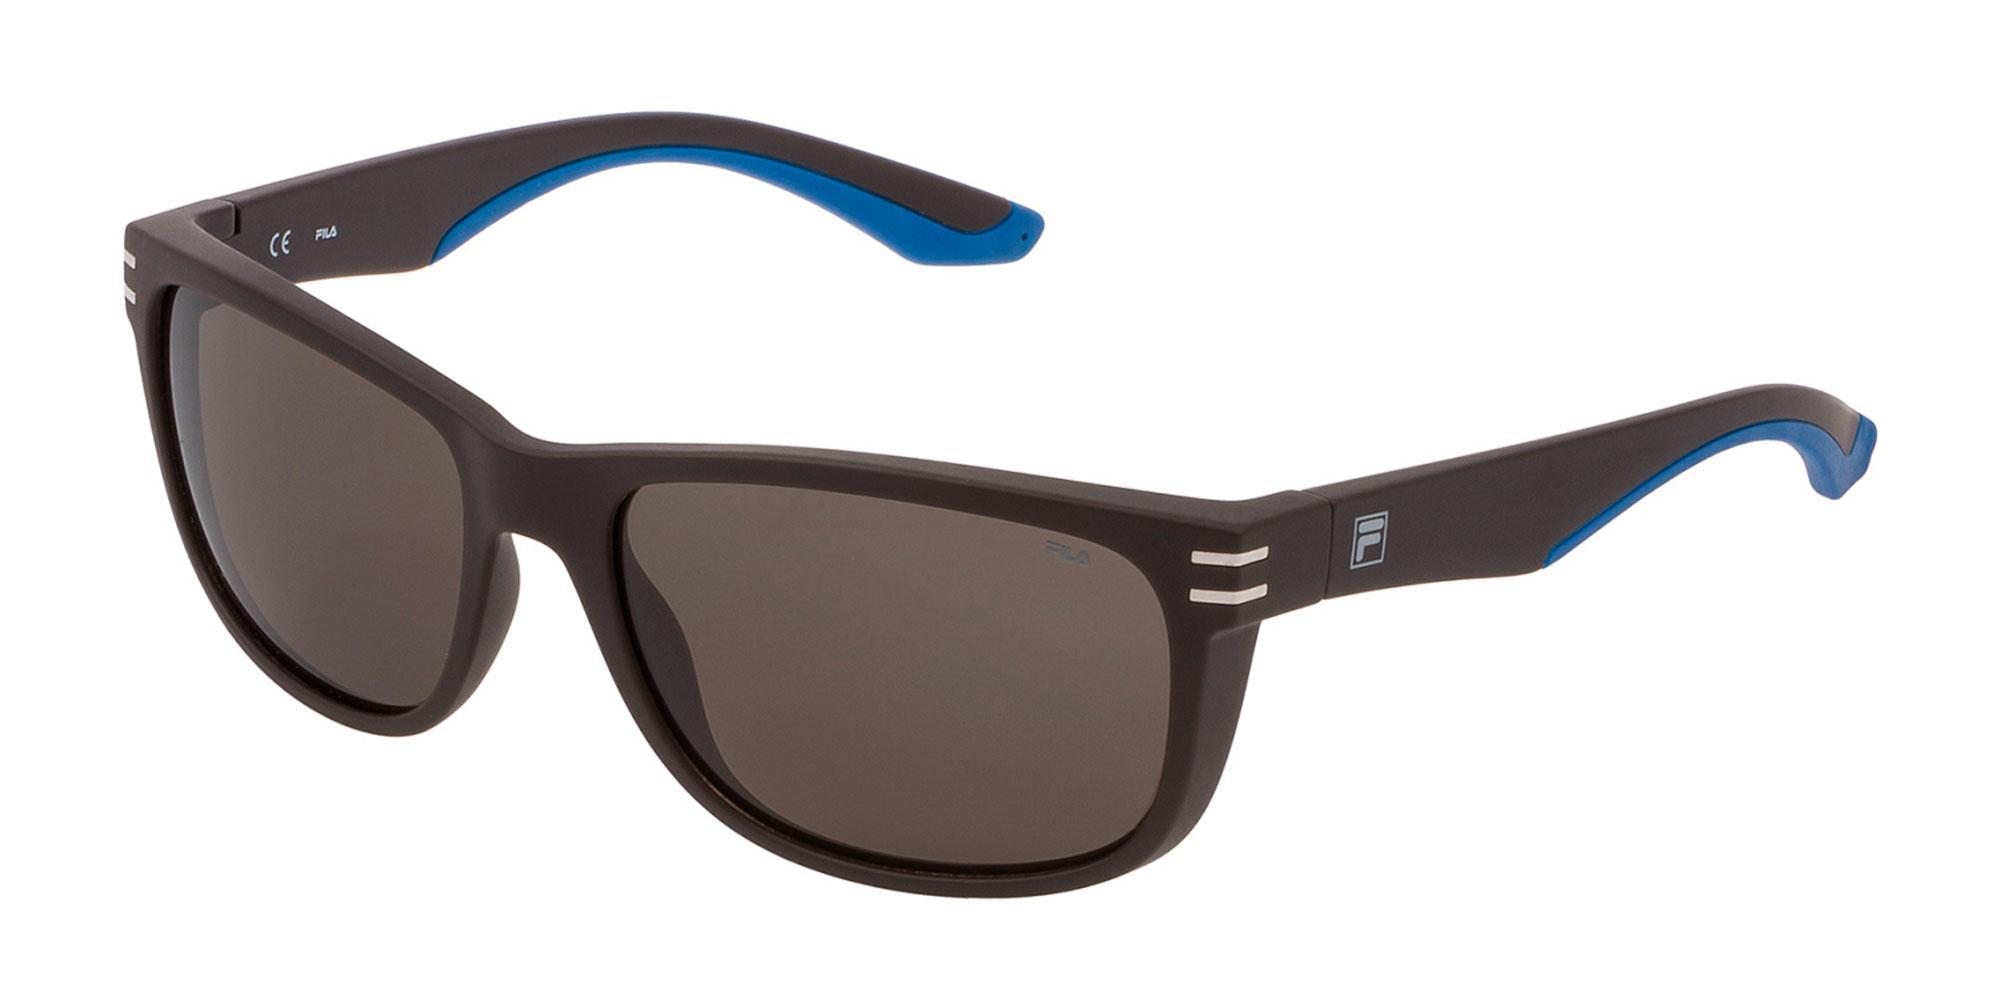 6XKP SF9251 Sunglasses, Fila